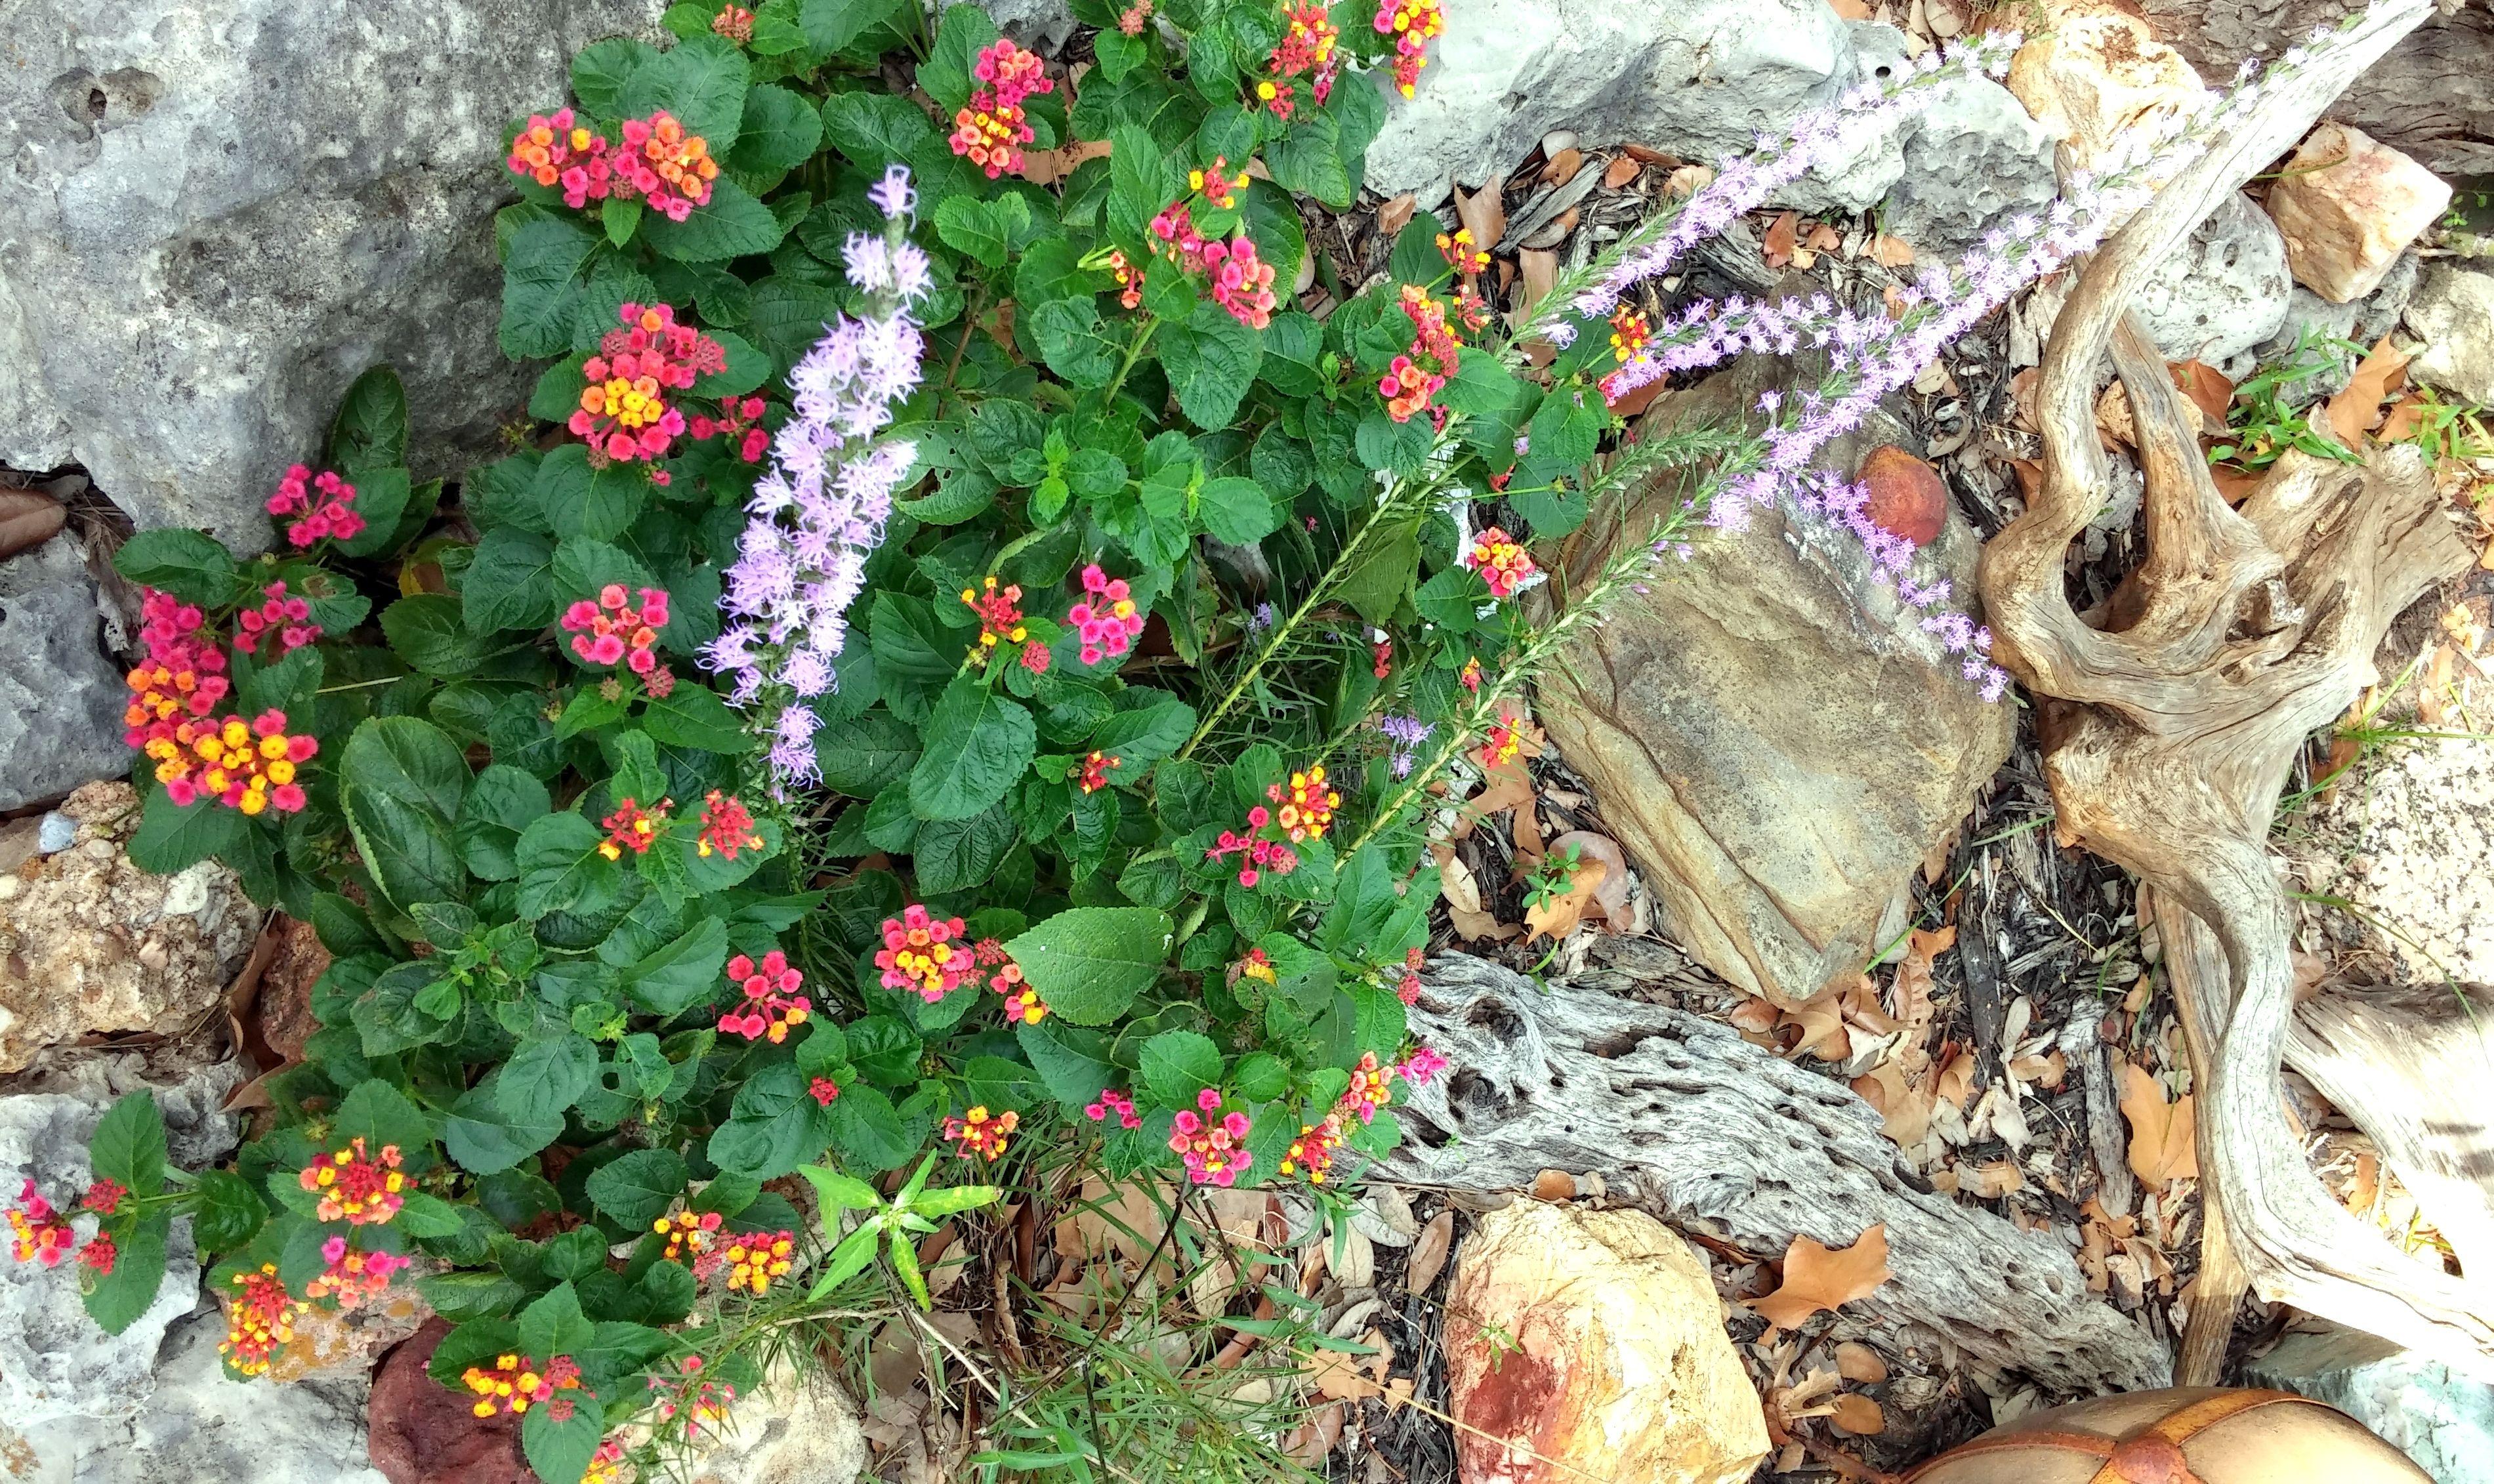 Fall Flowers in Bloom